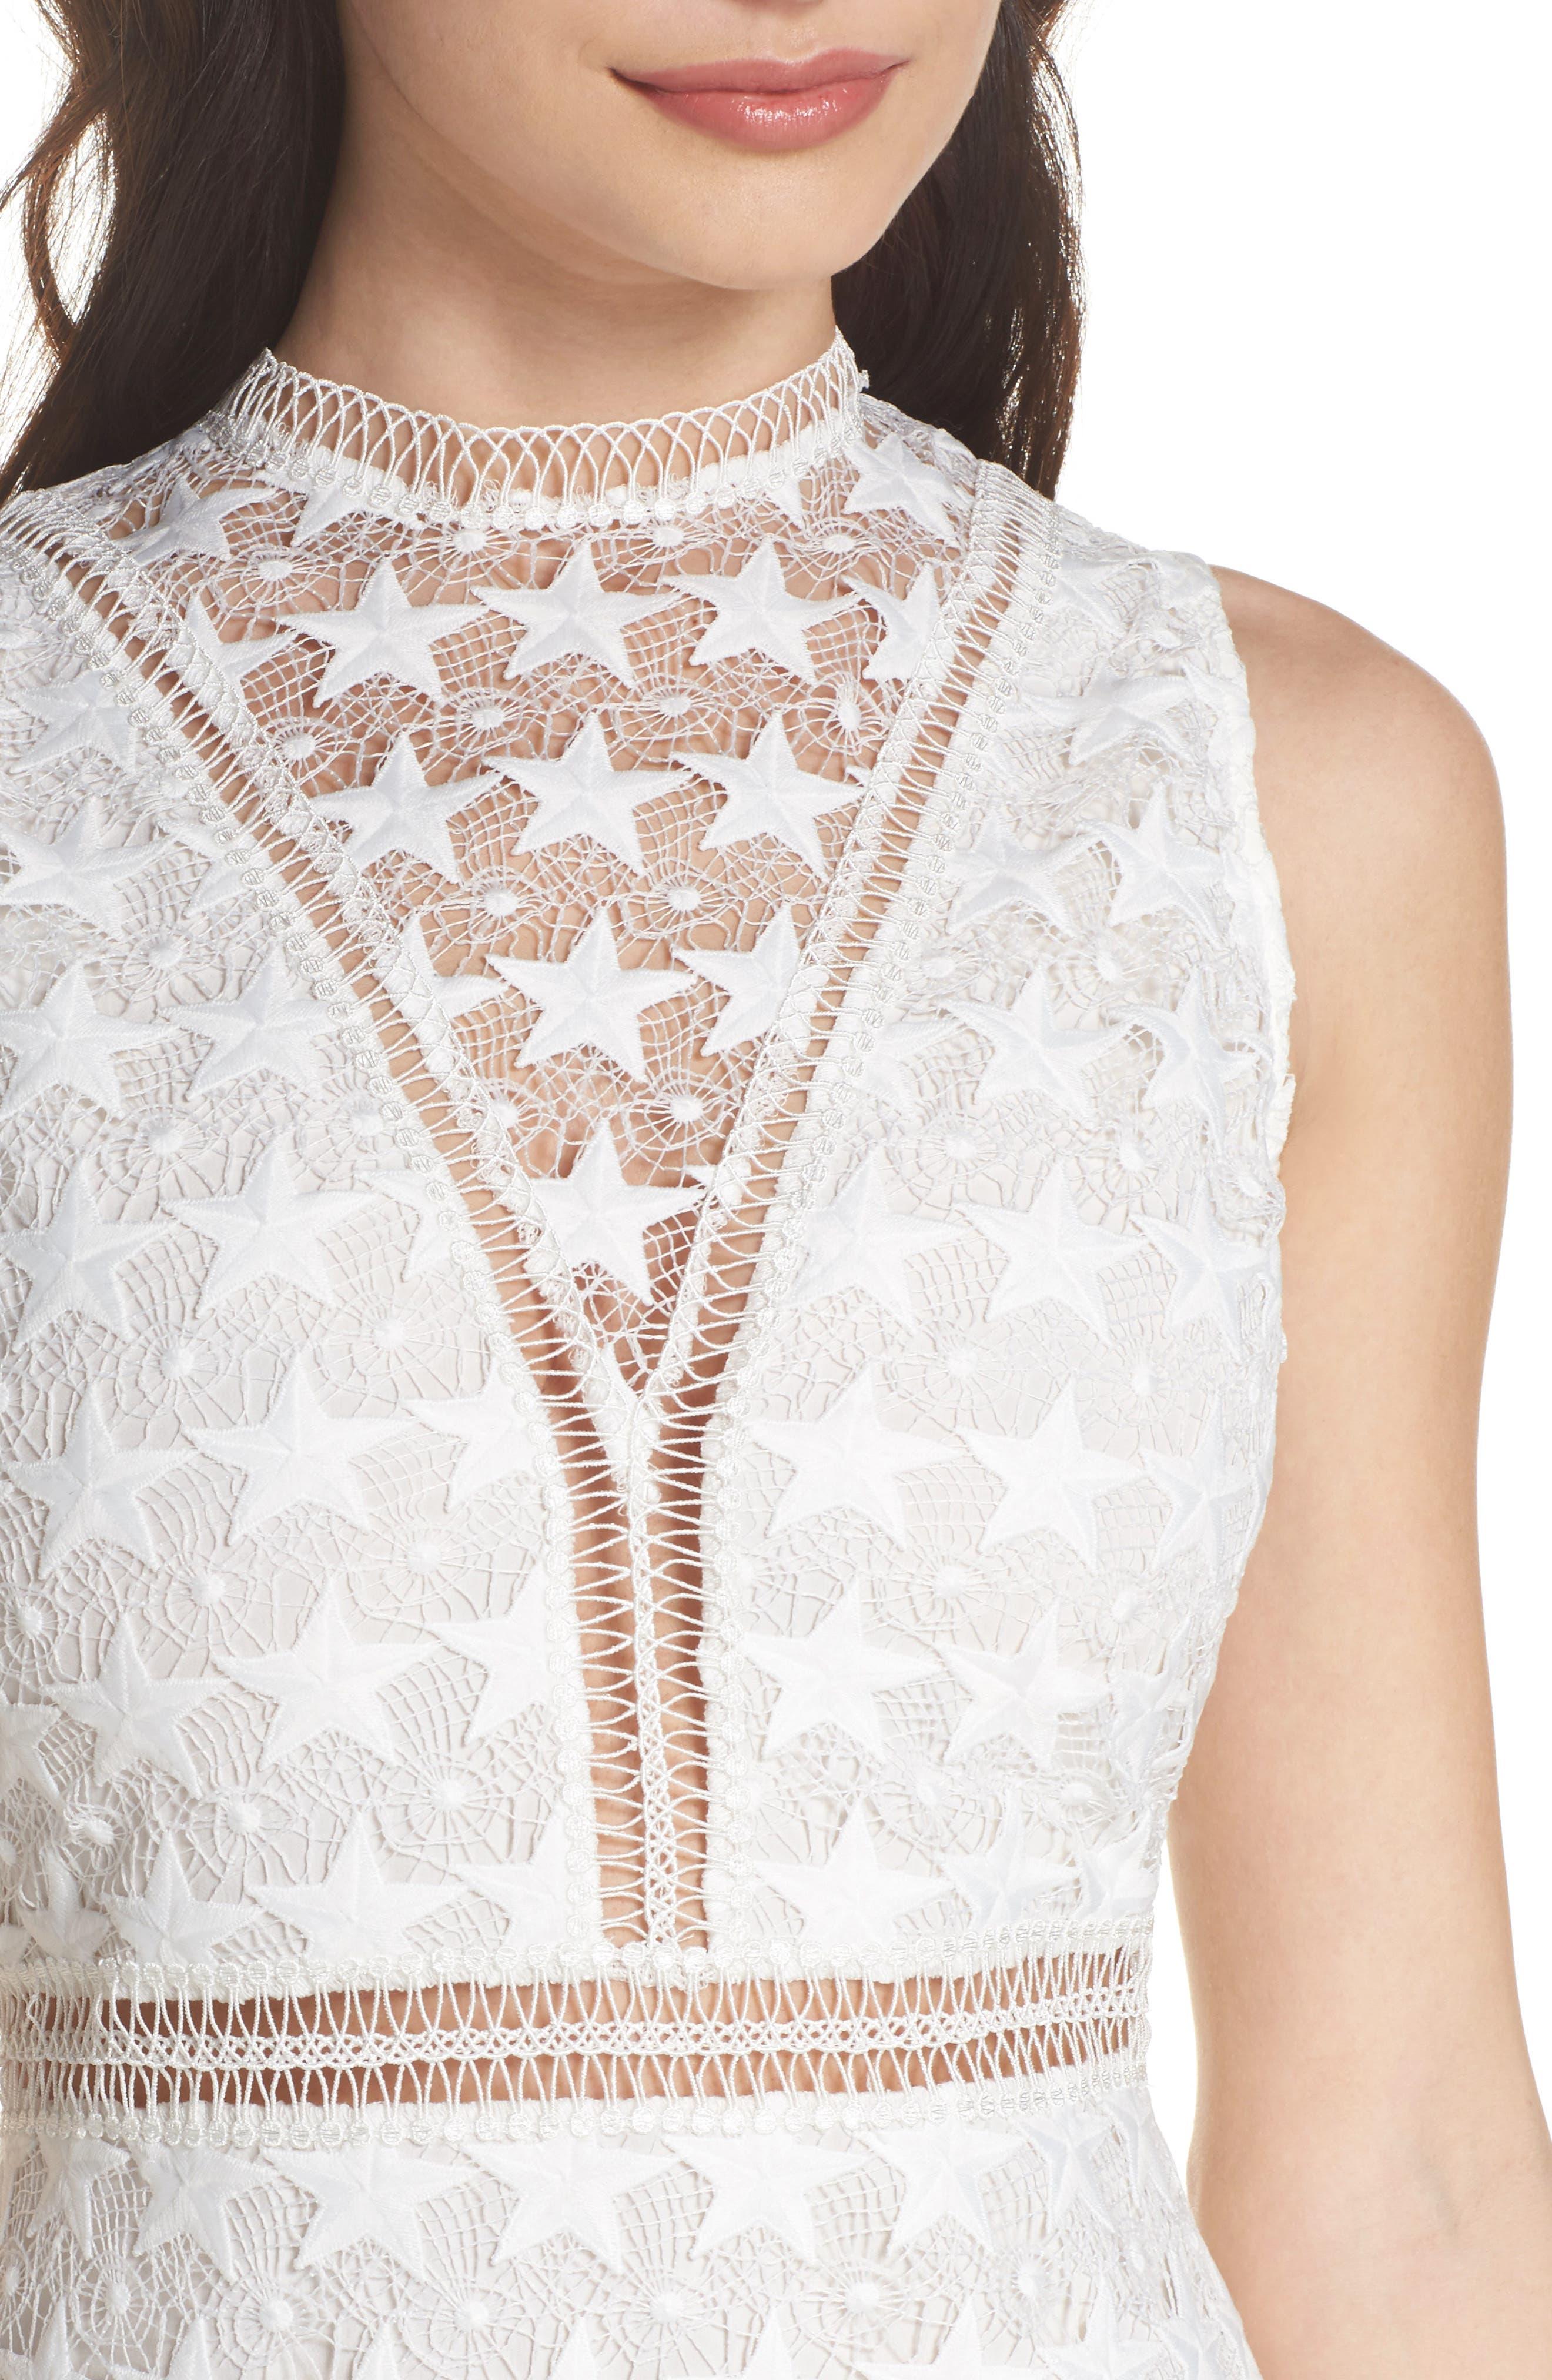 Star Lace Sheath Dress,                             Alternate thumbnail 4, color,                             IVORY